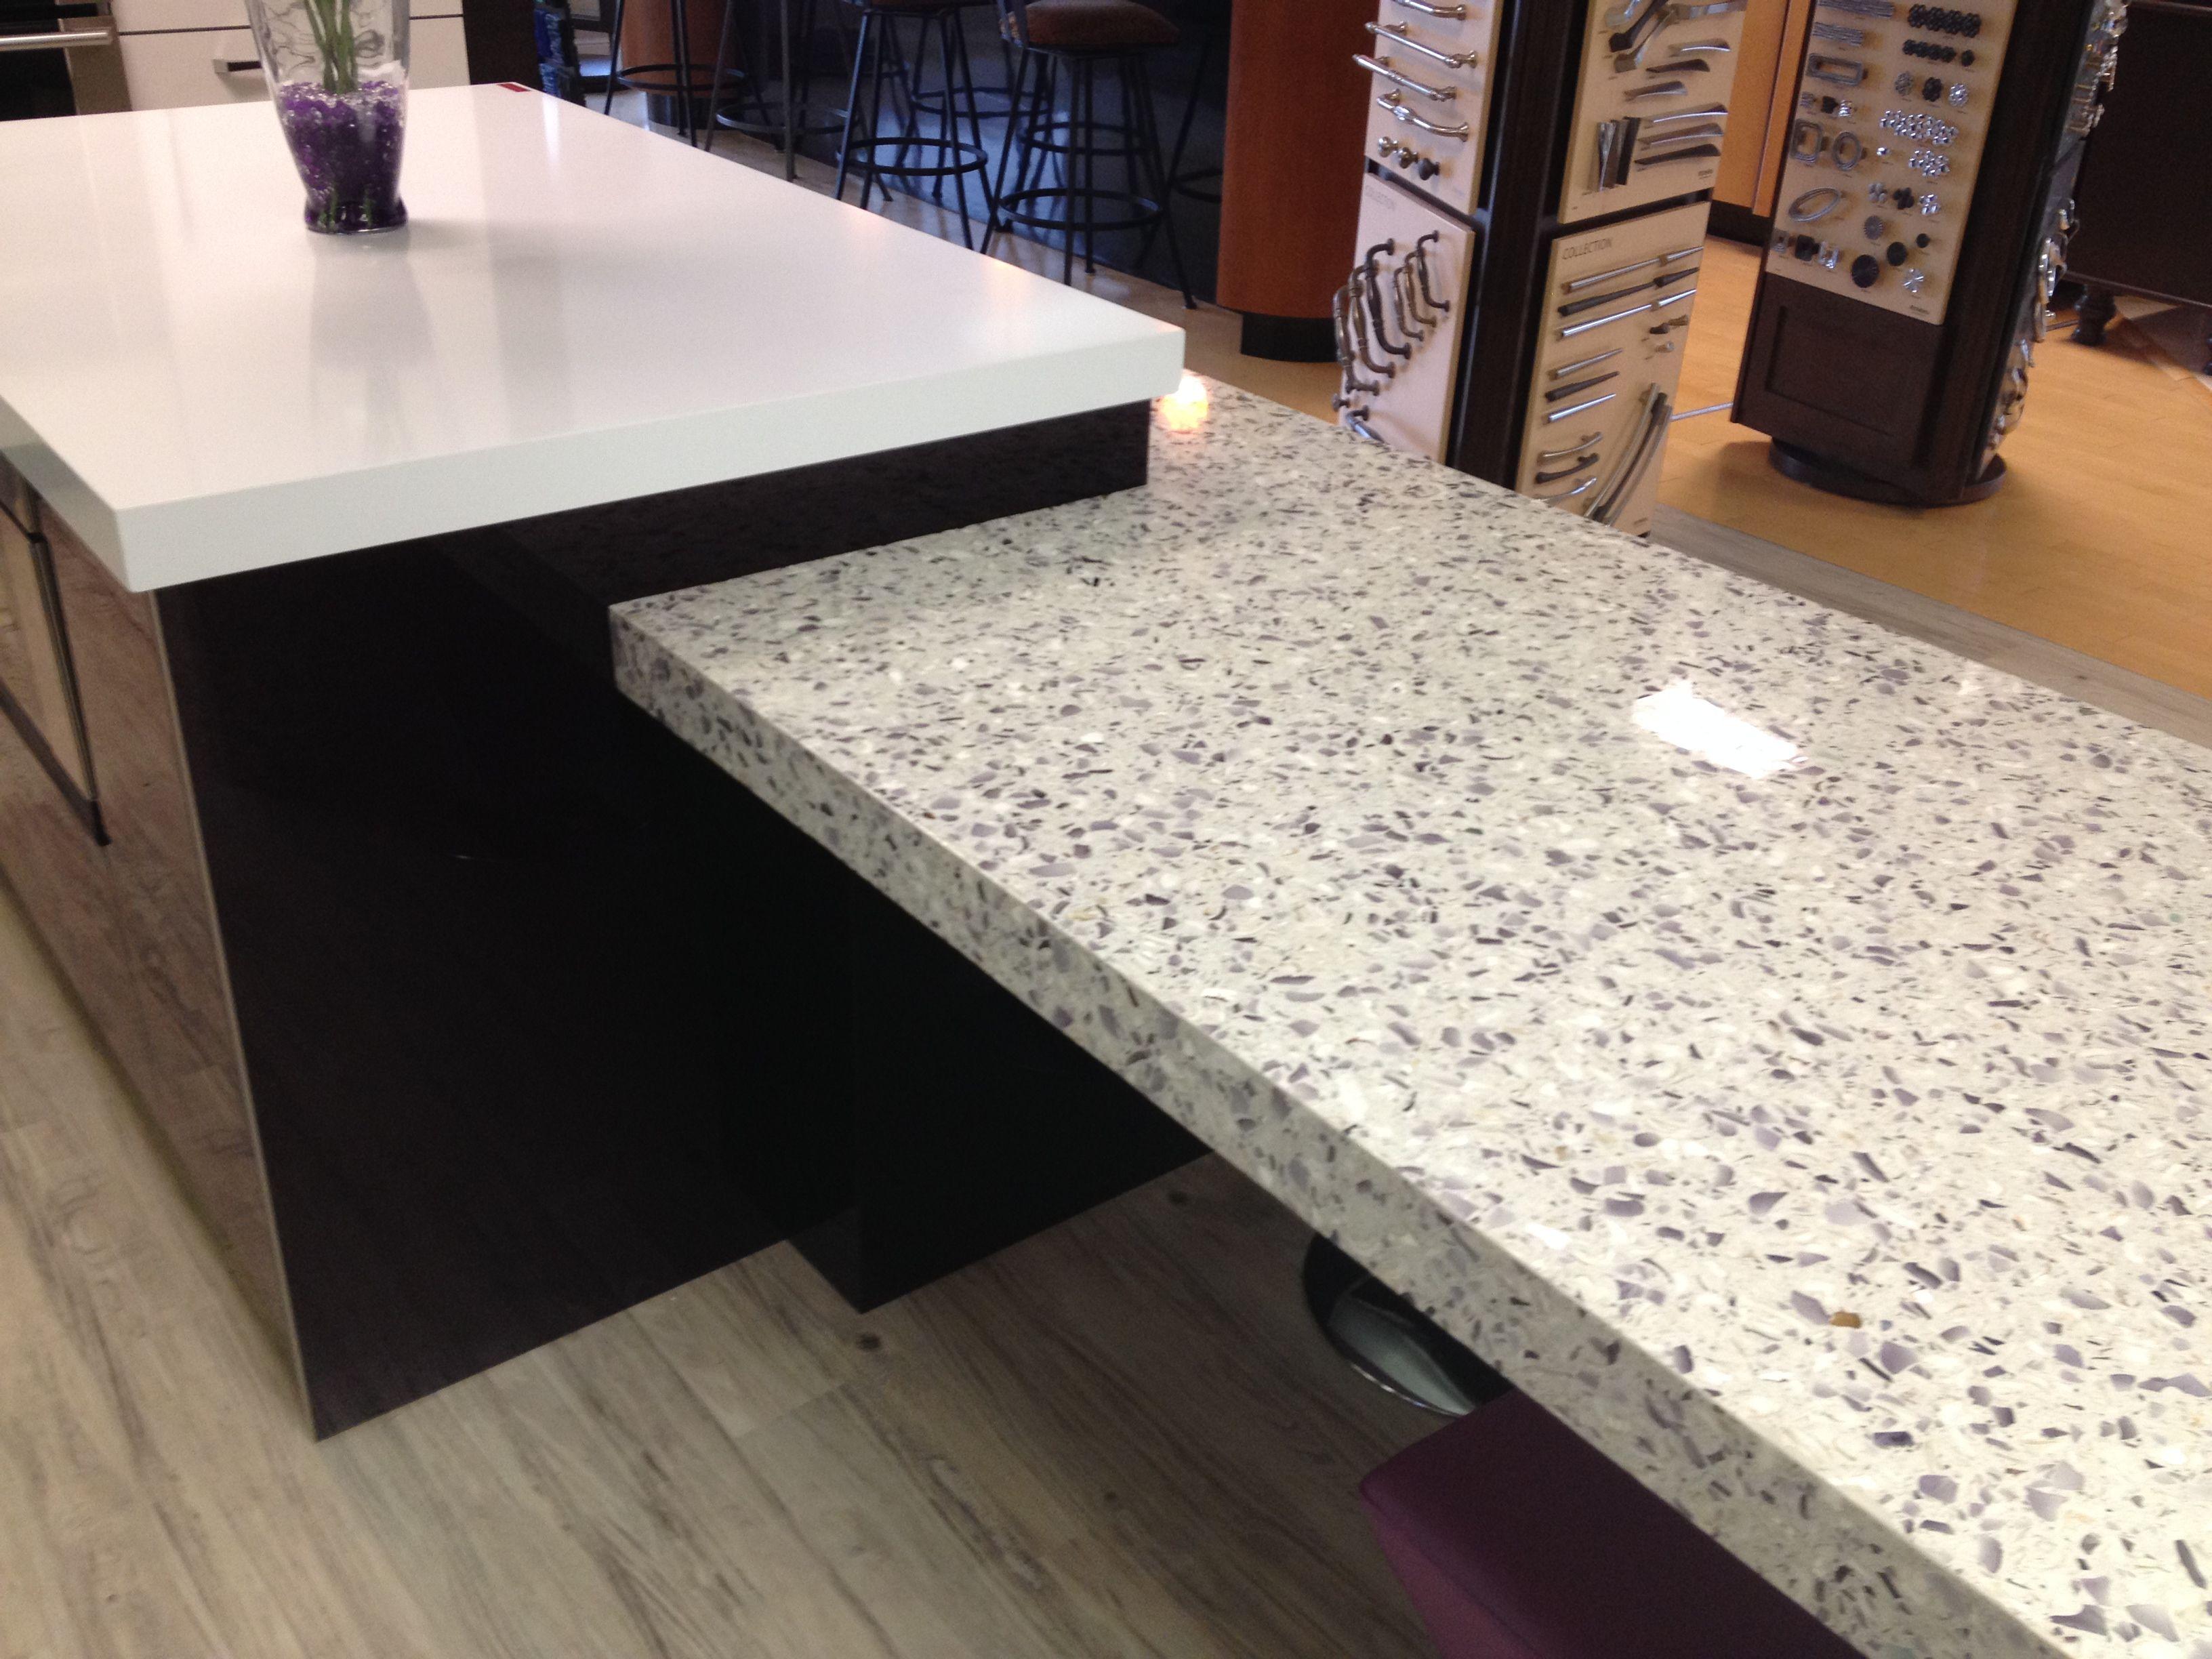 Amethystos VETRAZZO Recycled Glass U0026 POMPEII Quartz EXTRA EXTRA Countertop.  Www.umistone.com